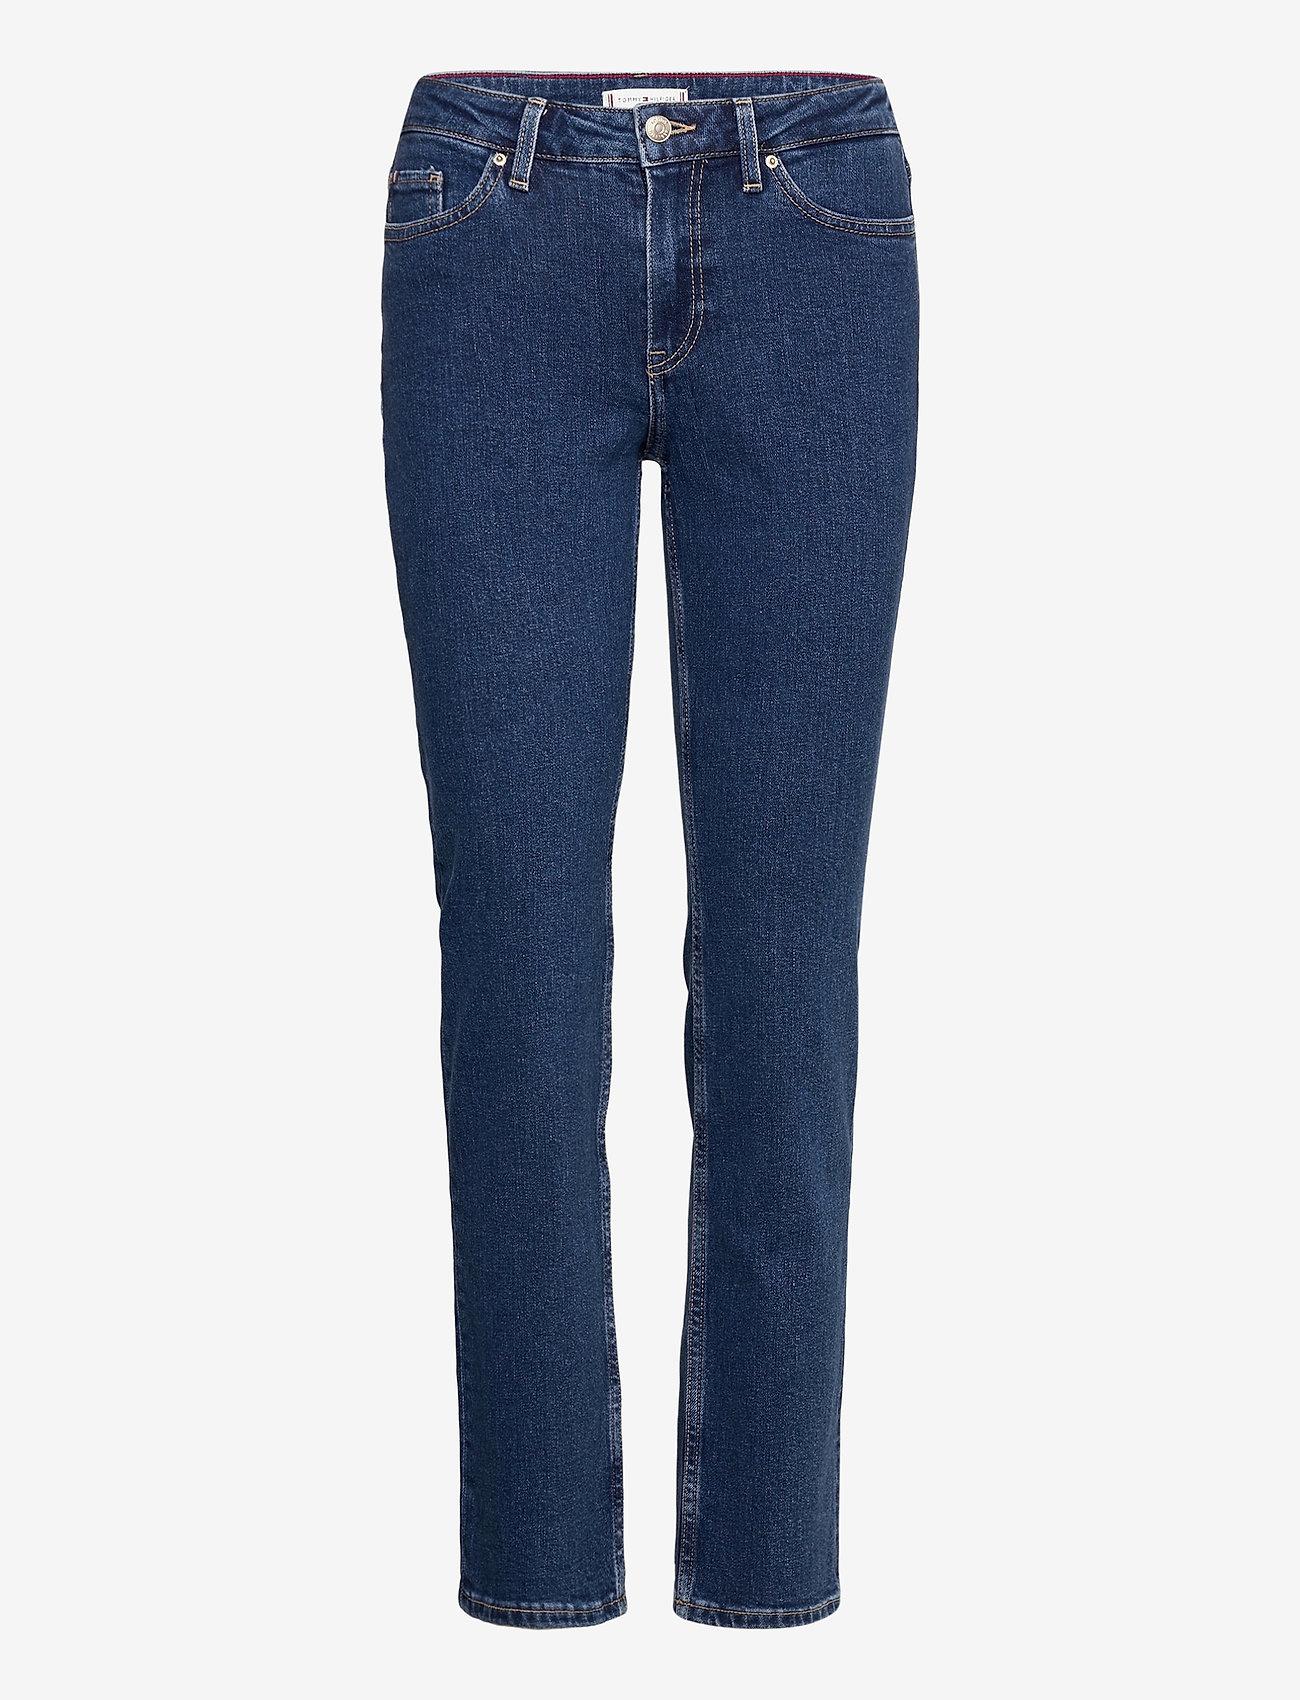 Tommy Hilfiger - ROME STRAIGHT RW CHRIS - slim jeans - chris - 0